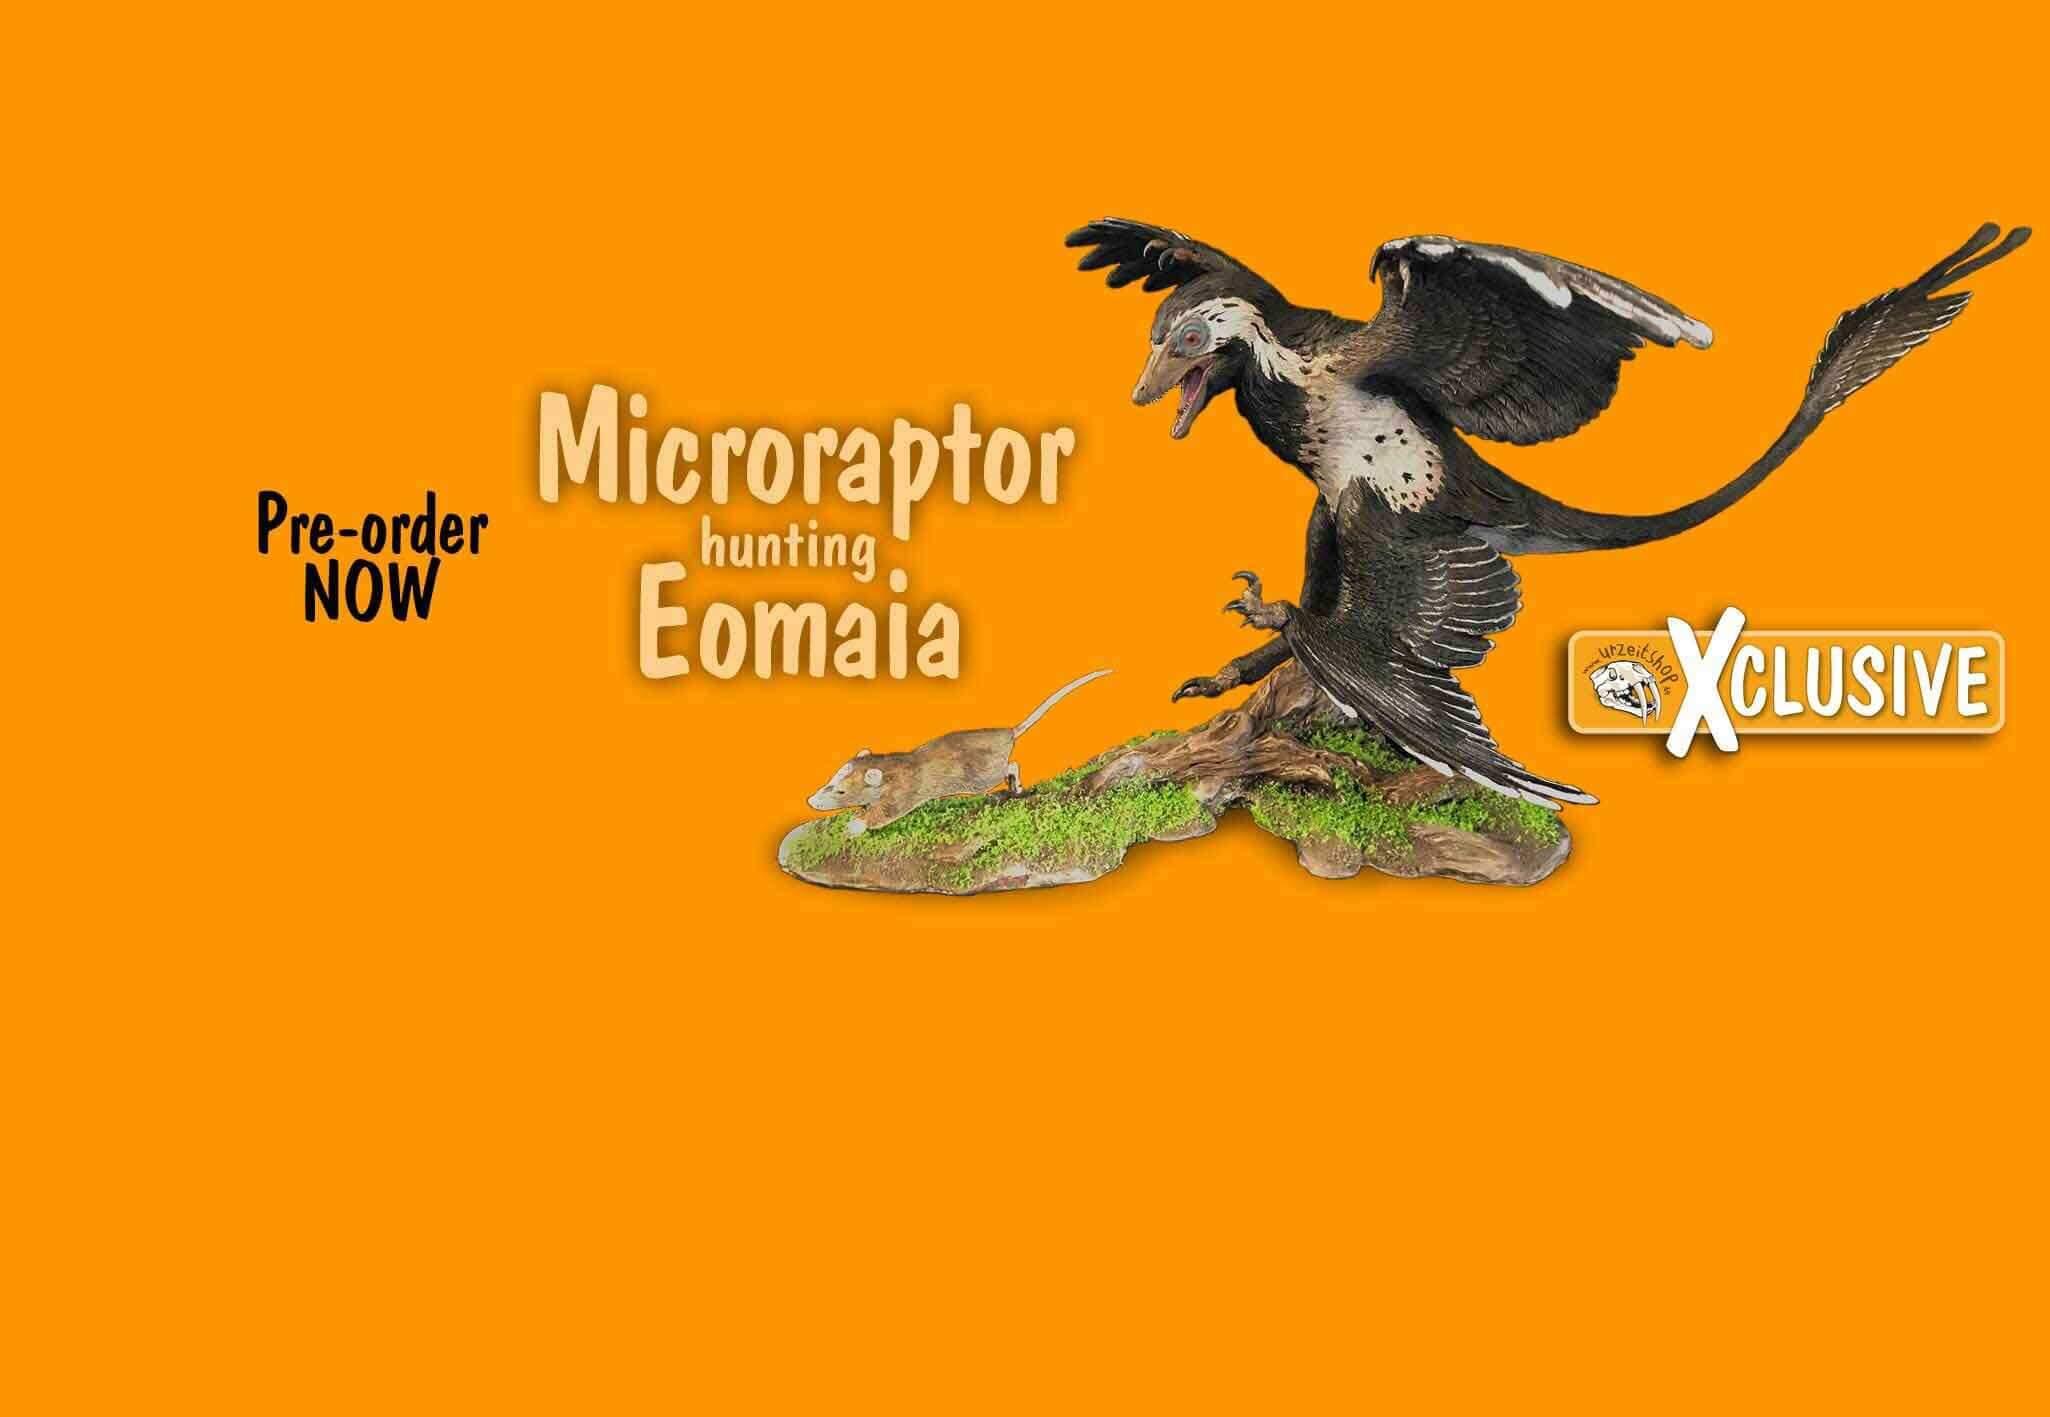 Pre-order now: Microraptor hunting Eomaia